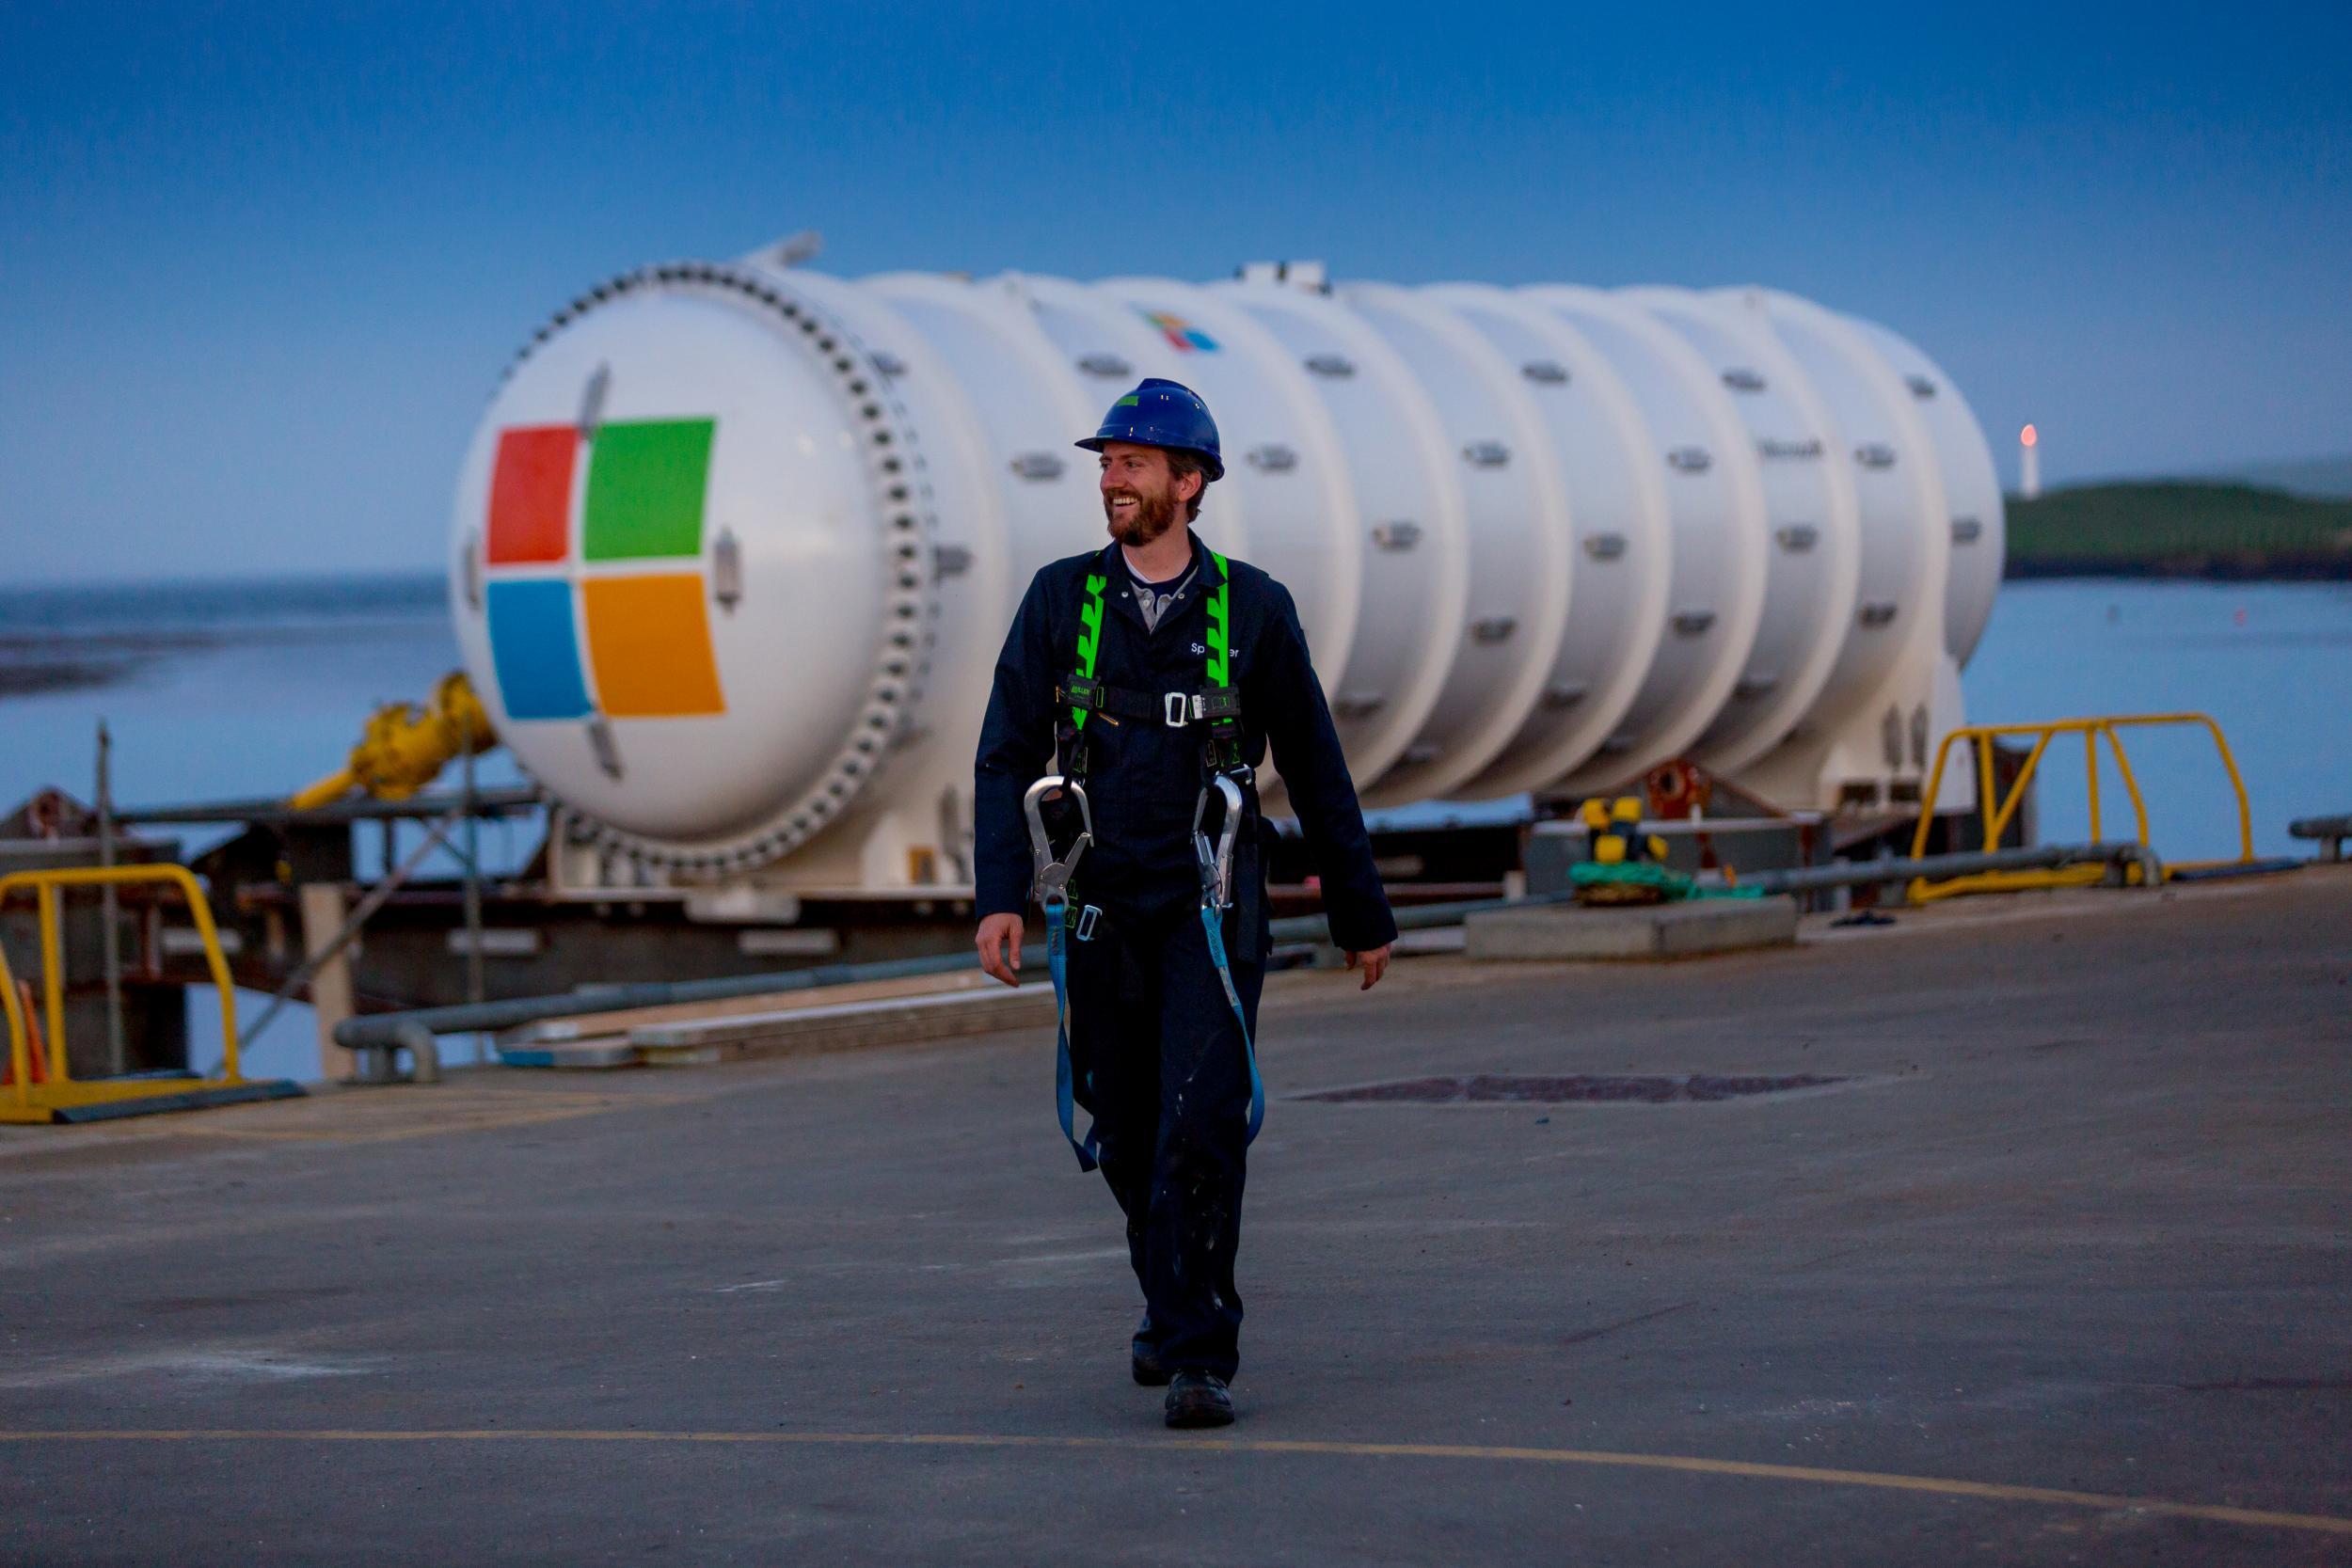 Eco-friendly internet: Microsoft sinks data centre off Scottish coast in 'crazy experiment'